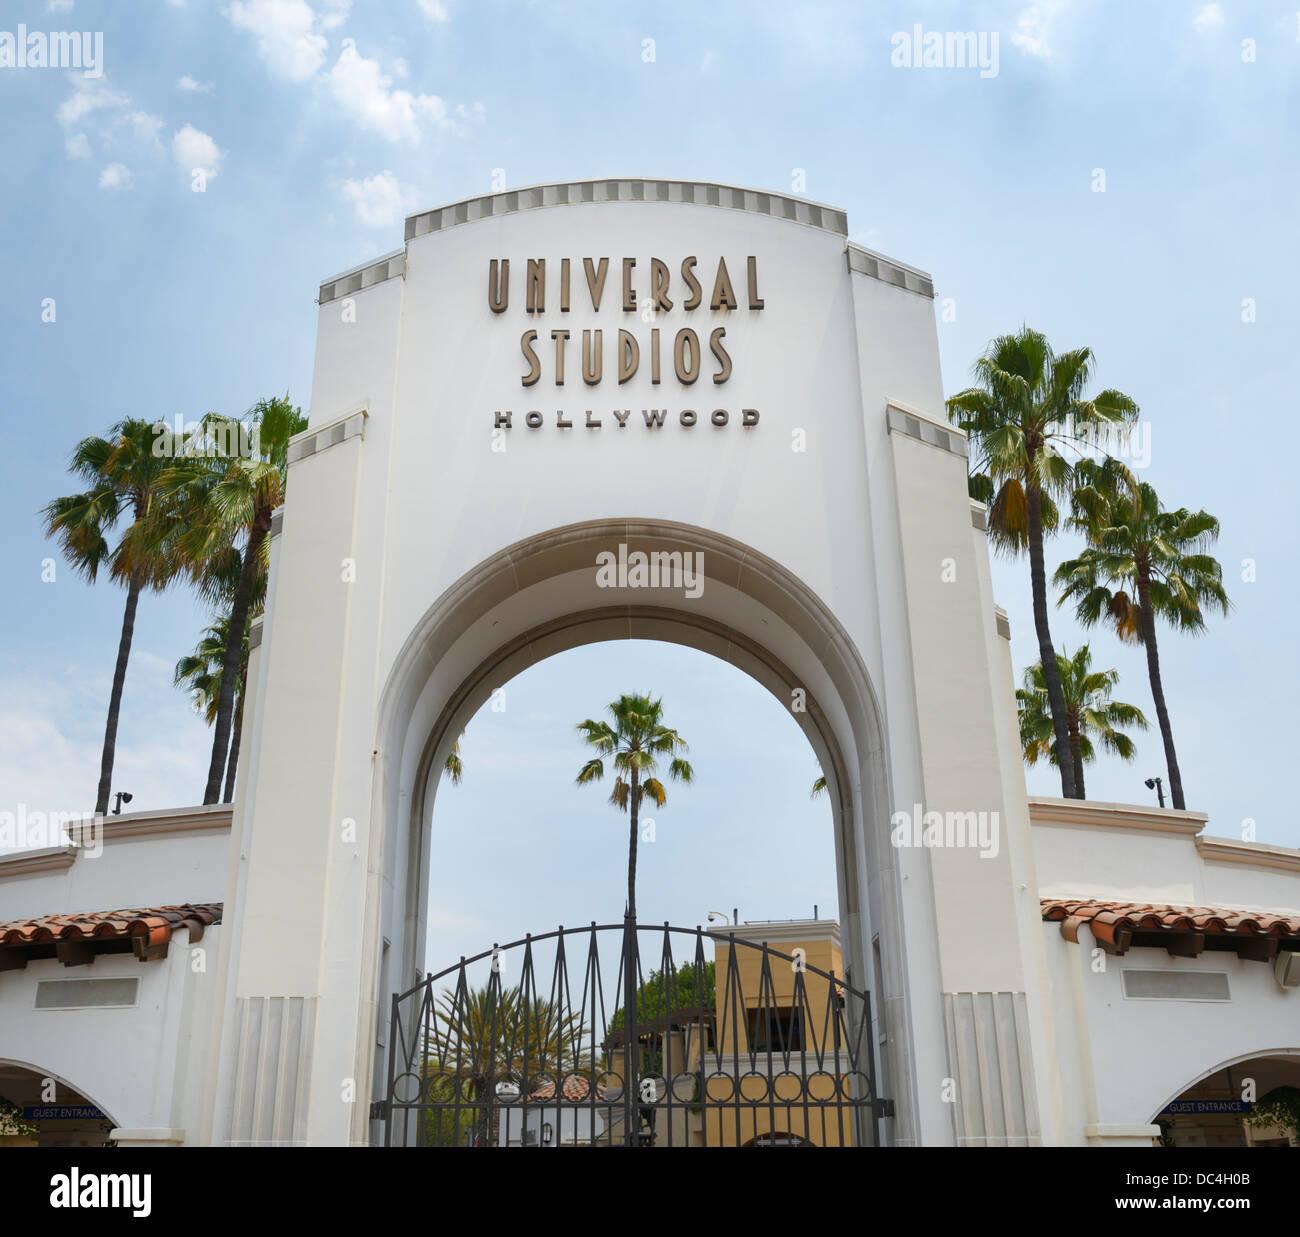 L'entrée des Studios Universal, Hollywood, CA Photo Stock